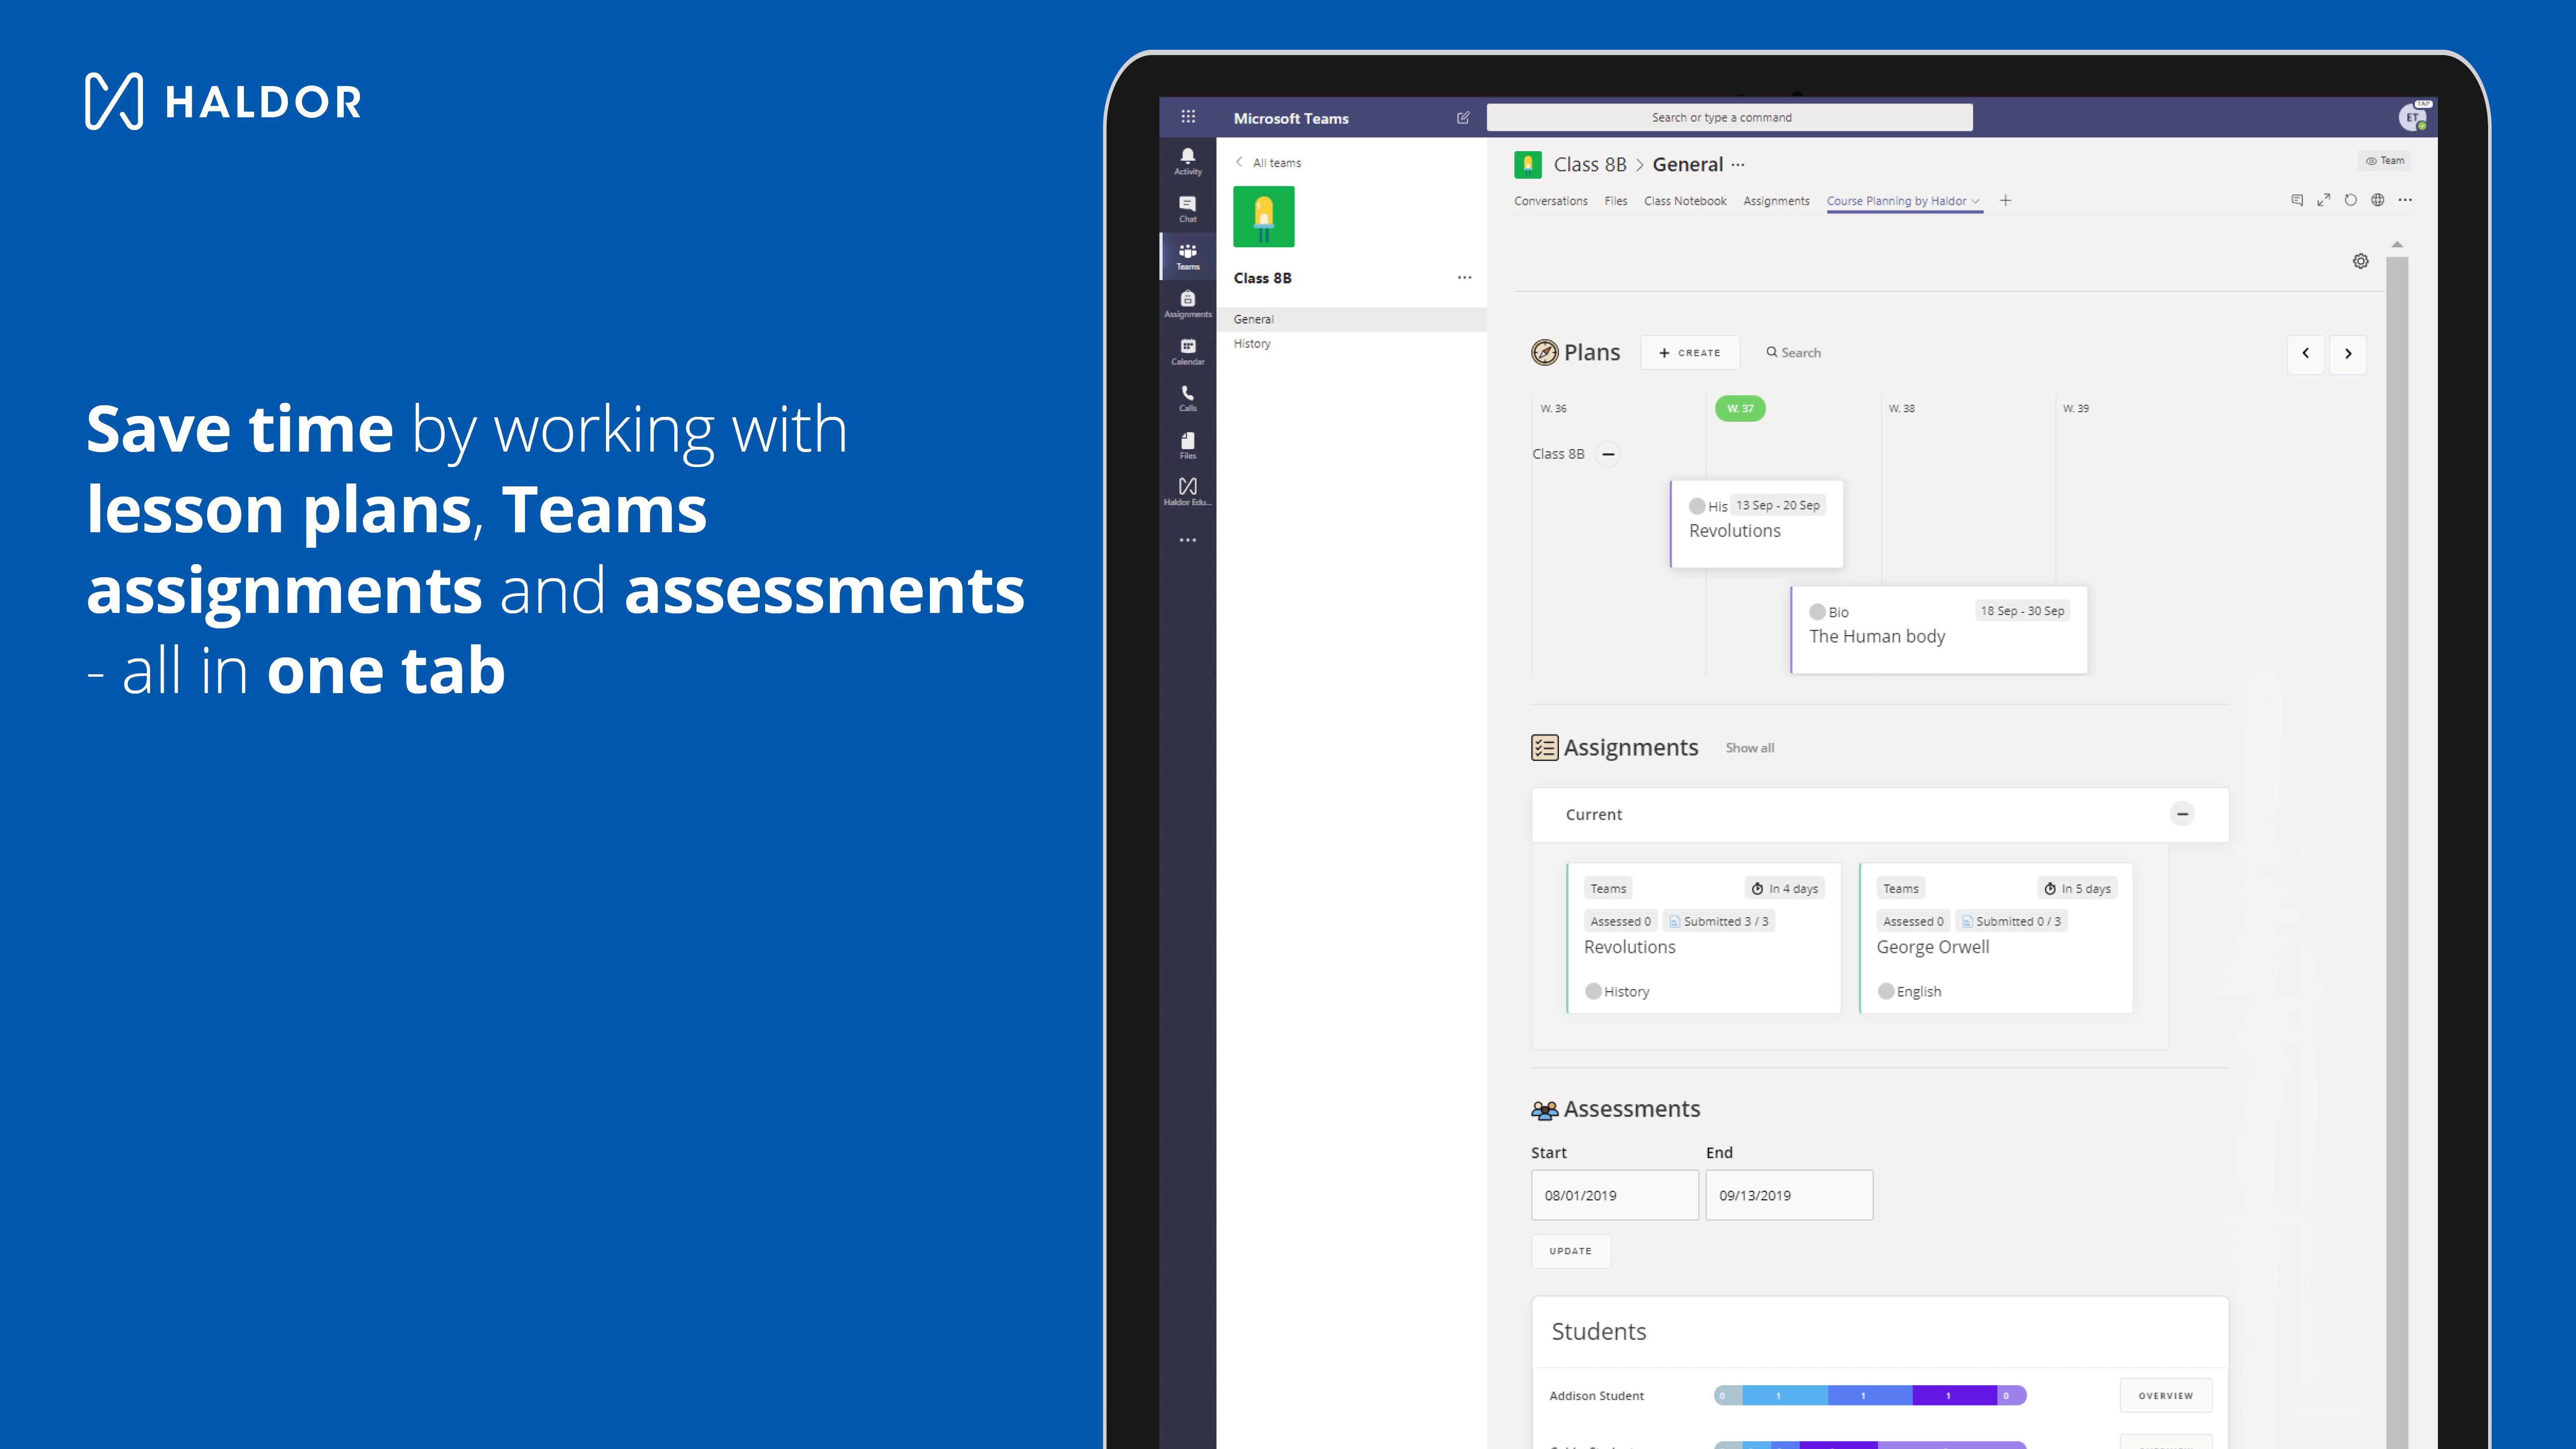 Screenshot - Haldor assignments and assessments